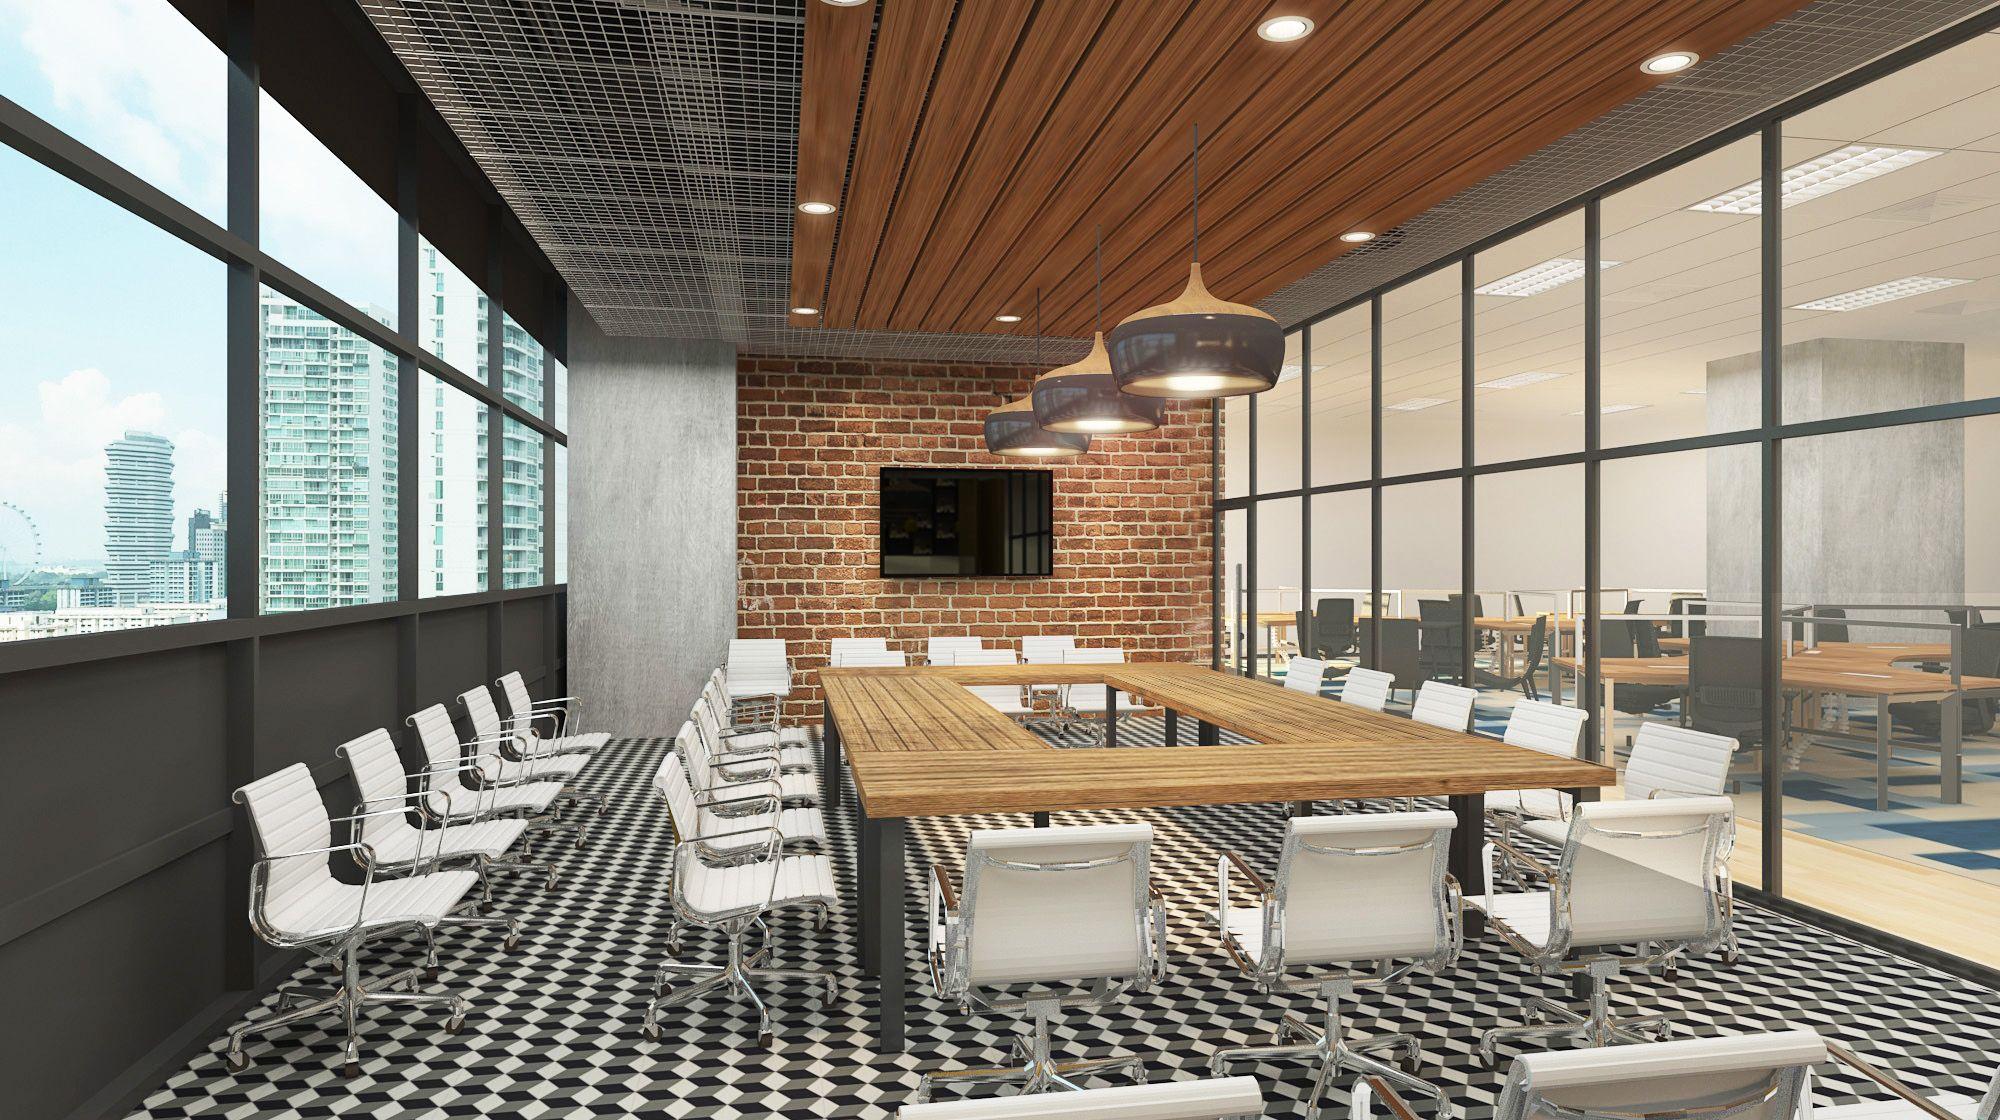 Good William Grant U0026 Sons, Singapore, Office Design Proposal By Kelvin U0026 Frank  Reid